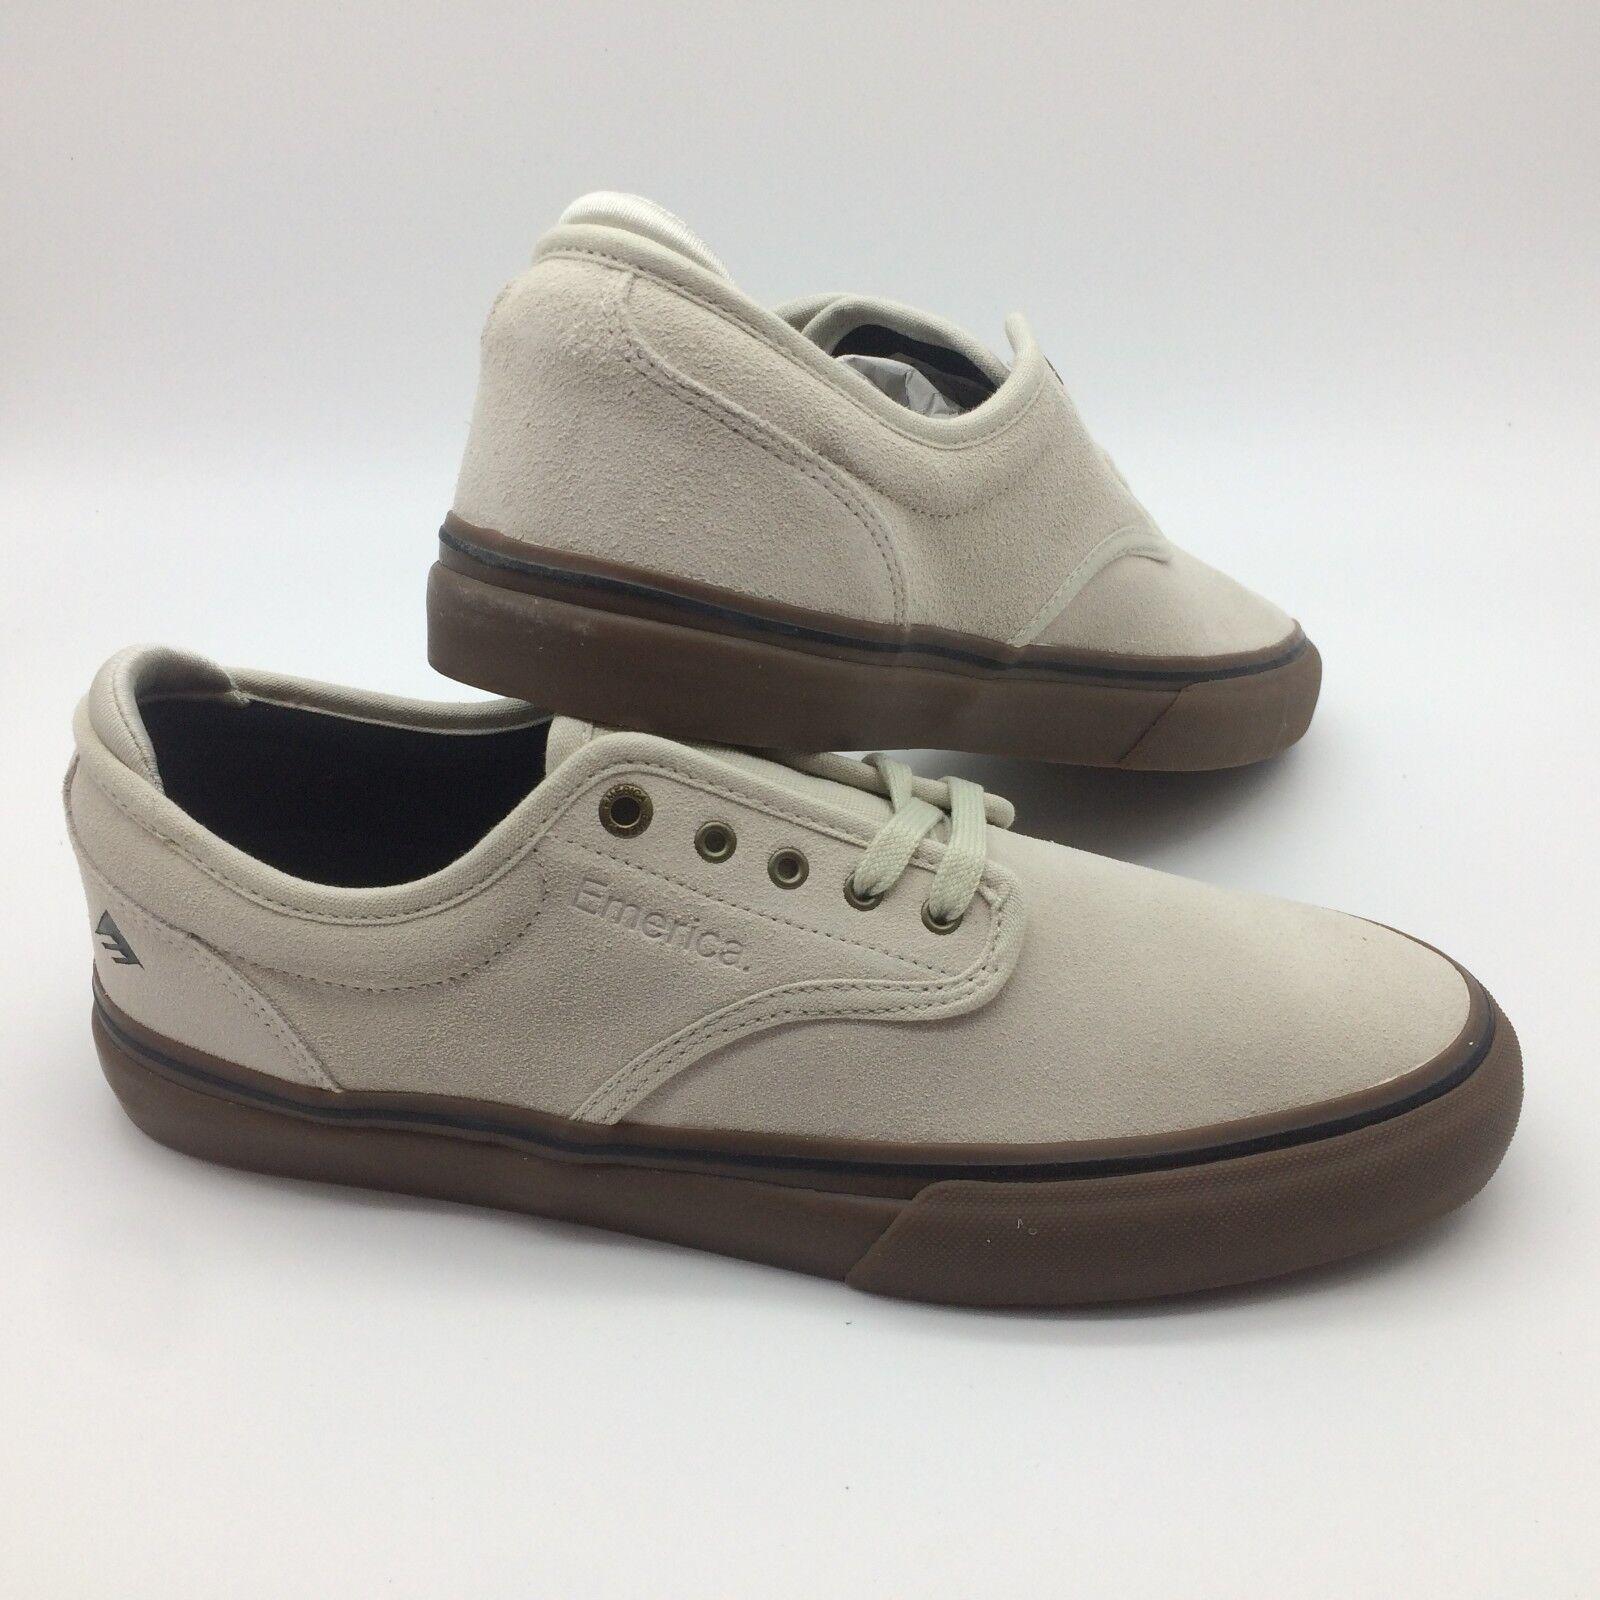 Emerica Men's shoes  Wino G6 SMU  --(BONE)WHITE GUM